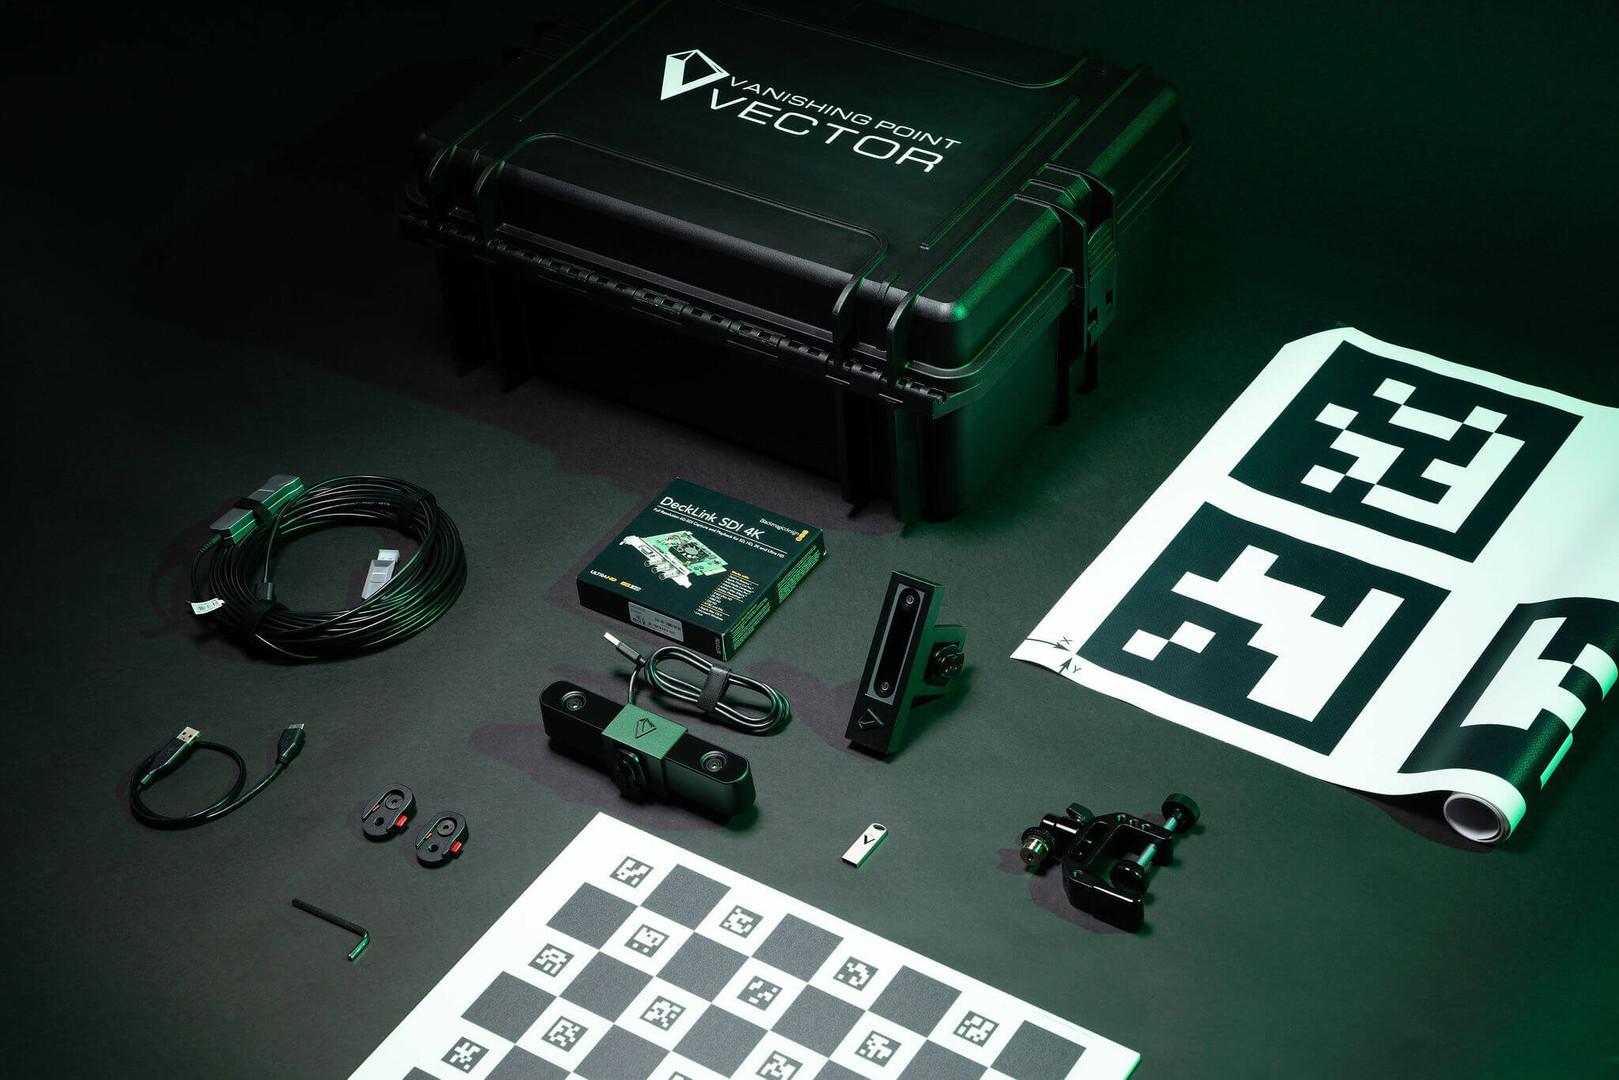 VAN1469-VanishingPoint-5-2.jpg